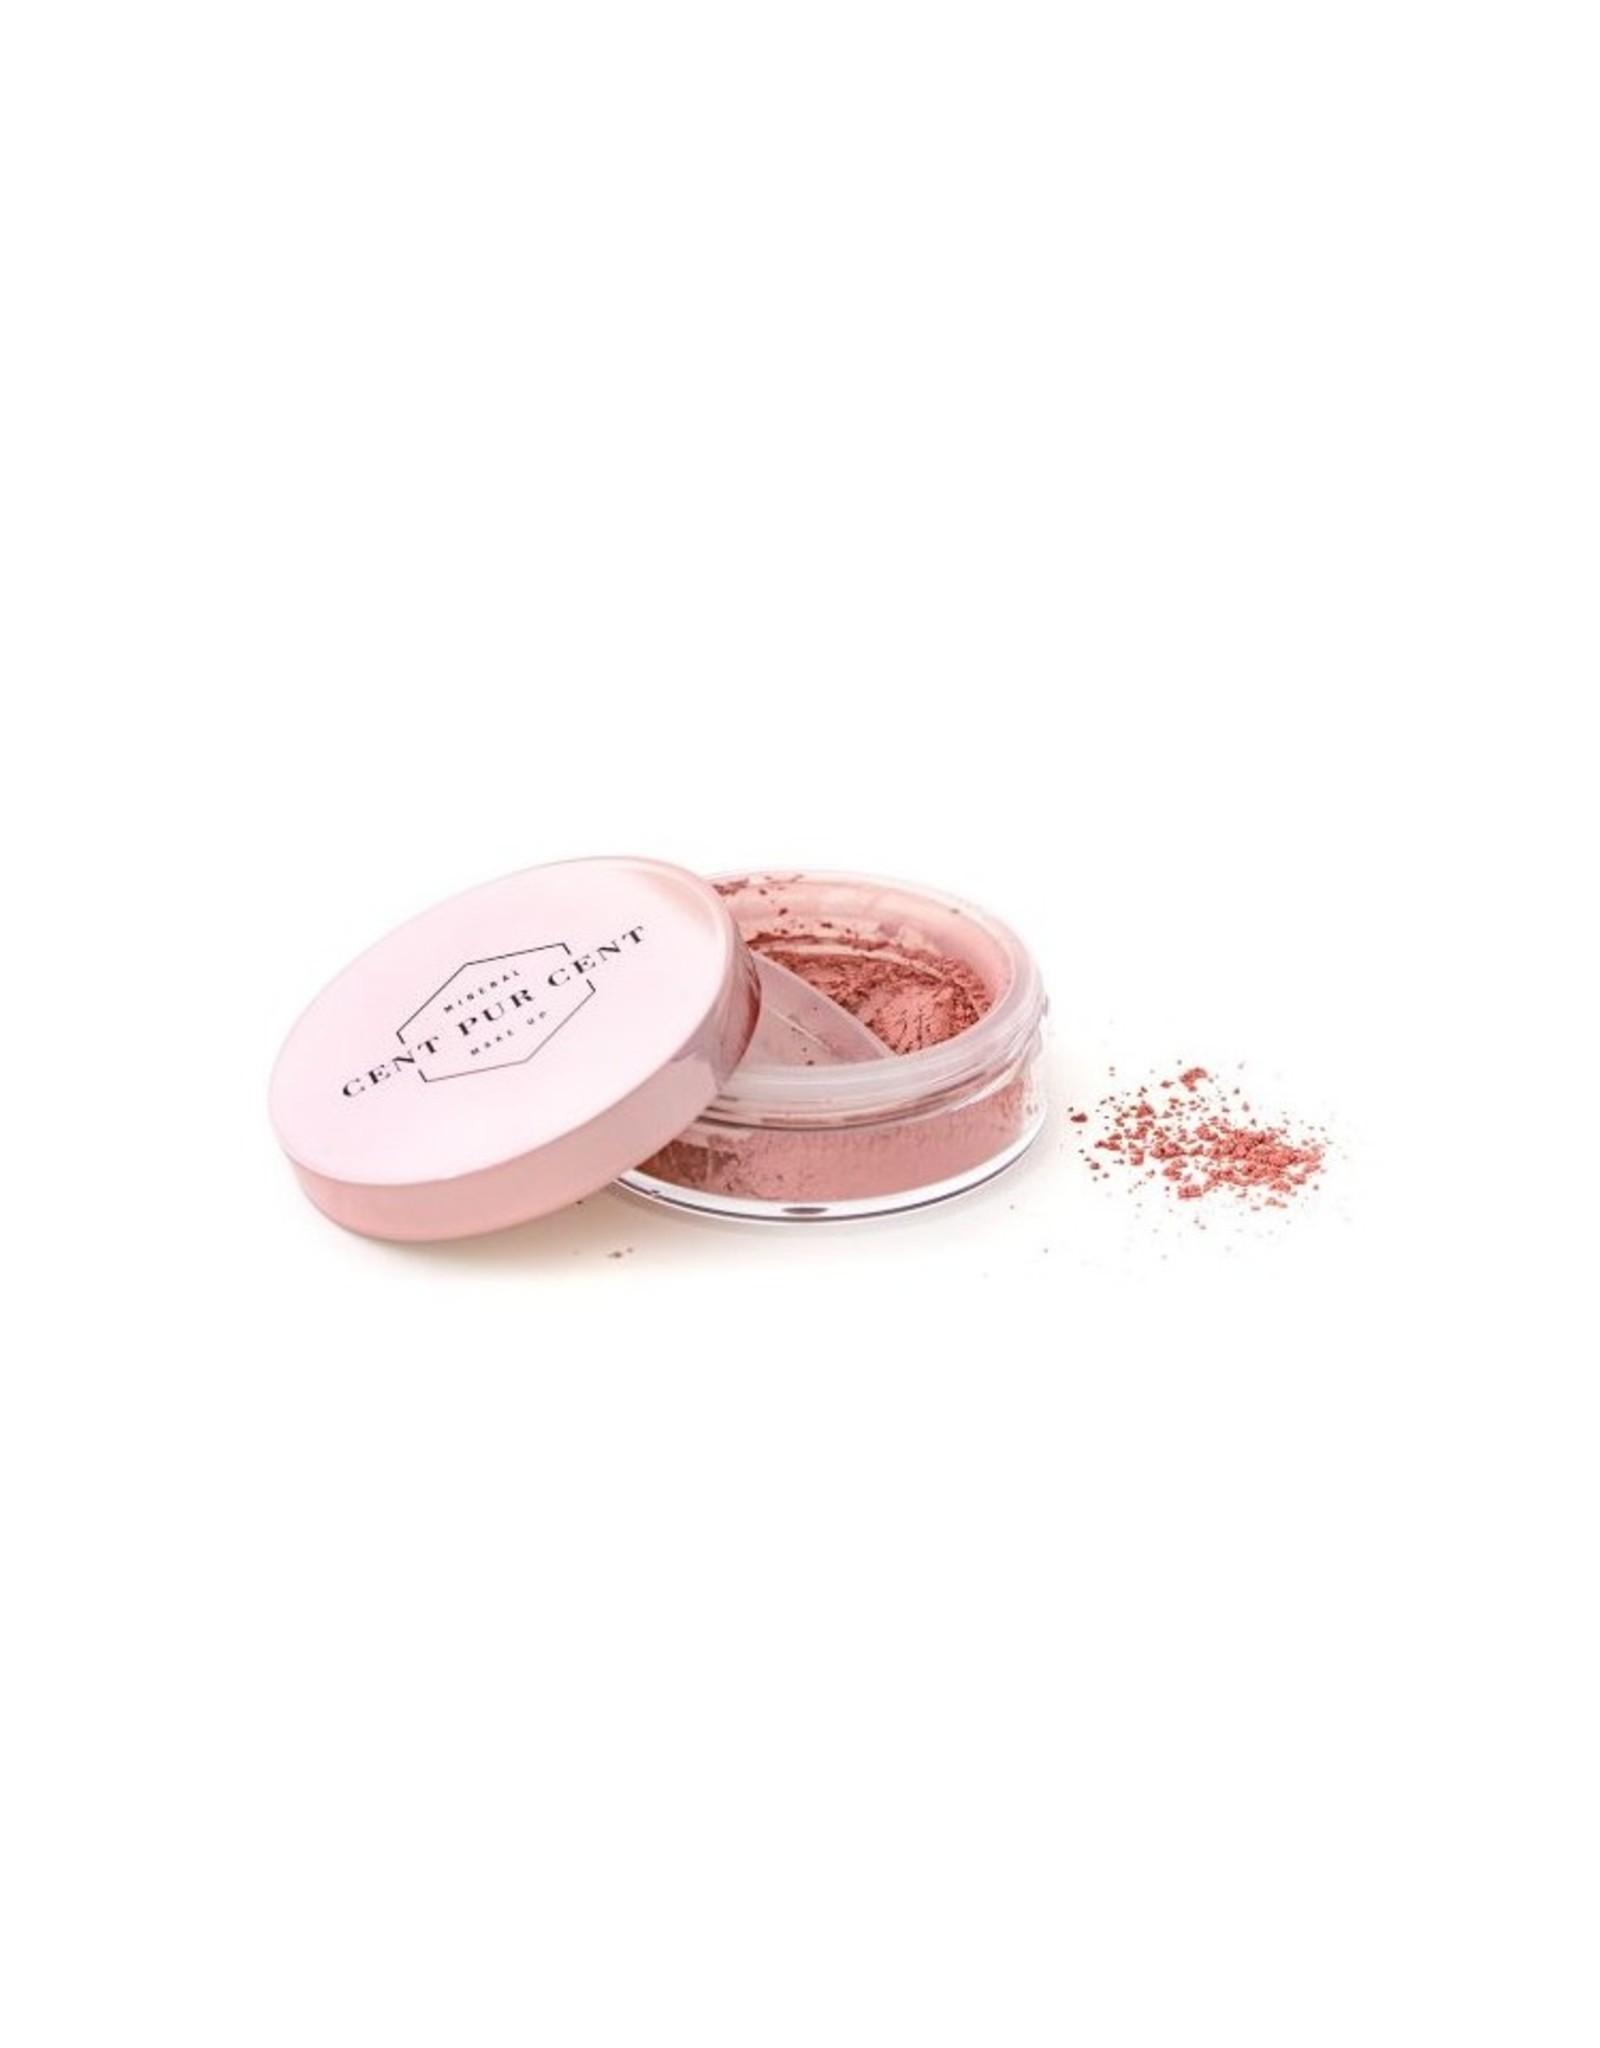 CentpurCent CentpurCent - Loose Mineral Blush Rose